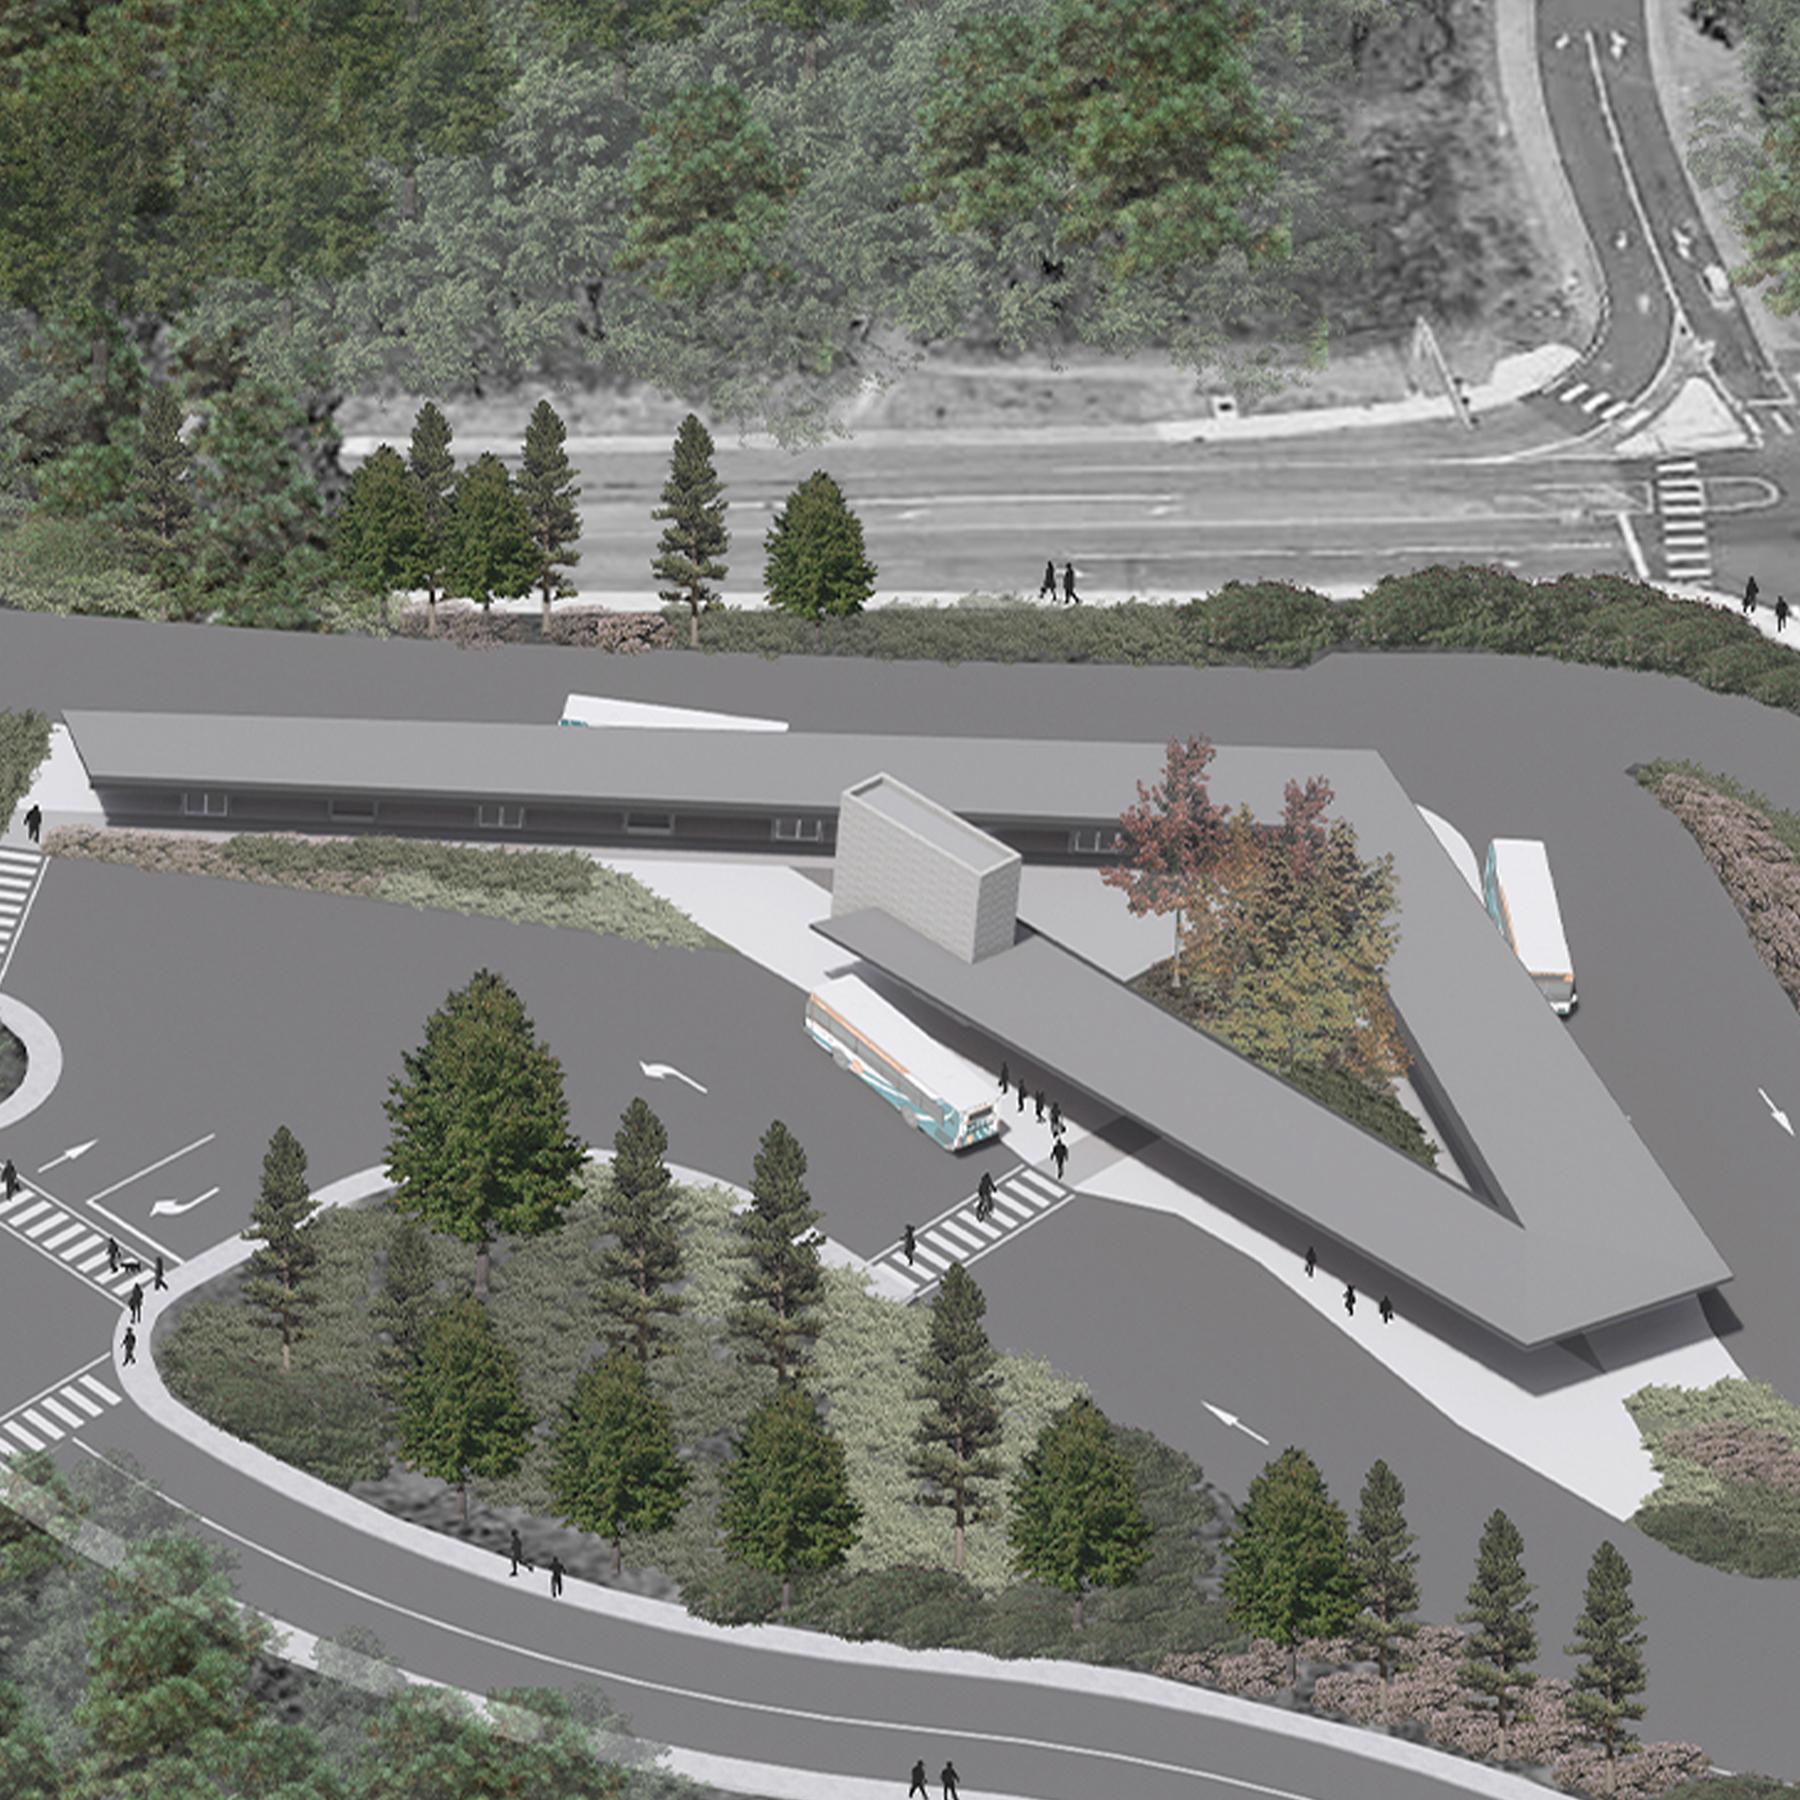 silverdale transit center -